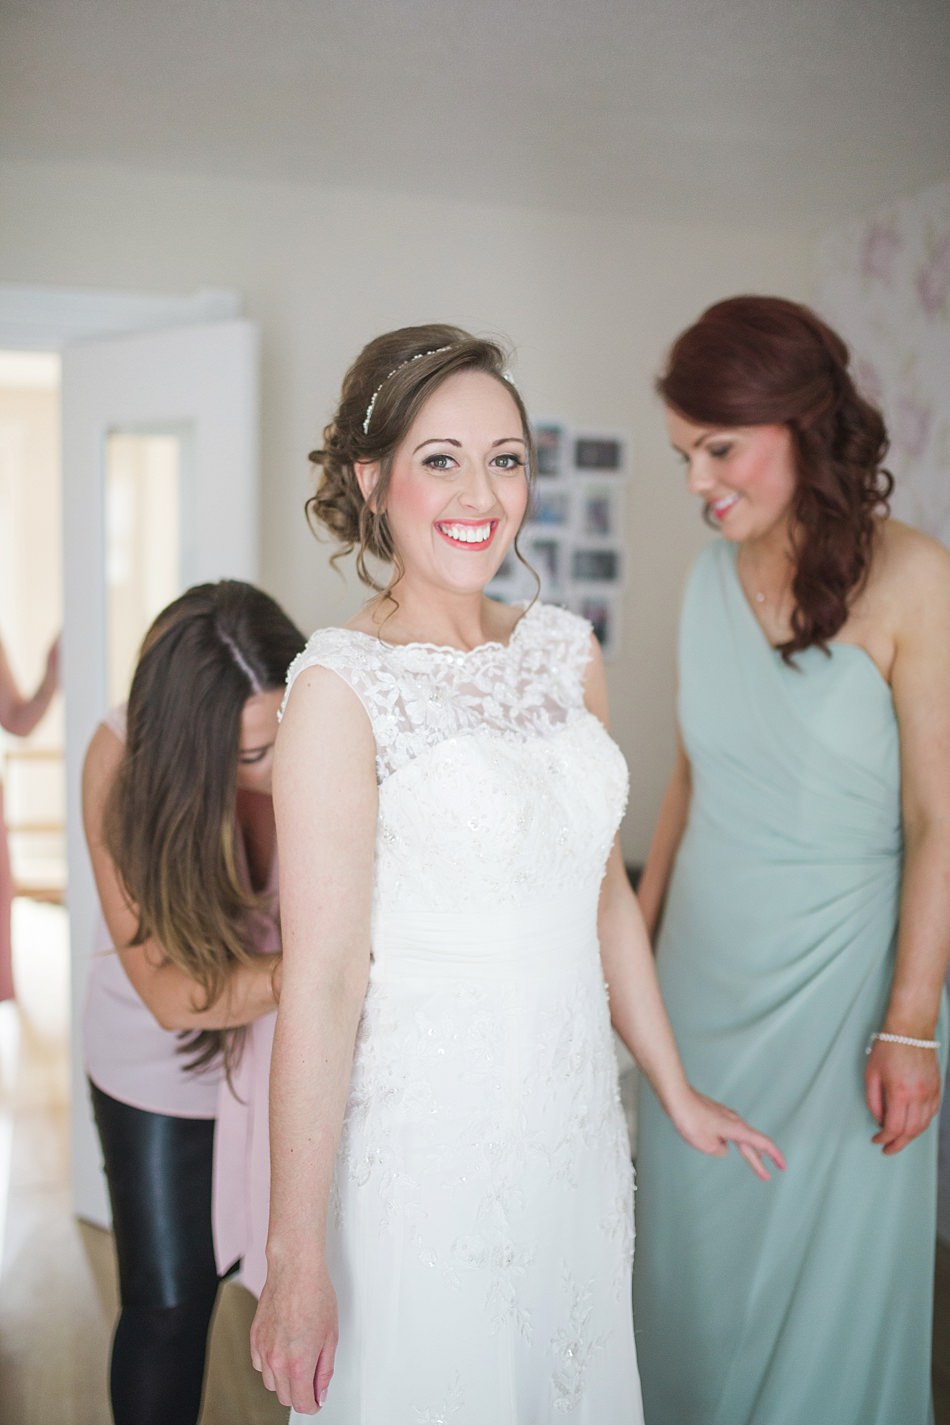 fine art wedding photographers glasgow scotland 4-9.jpg